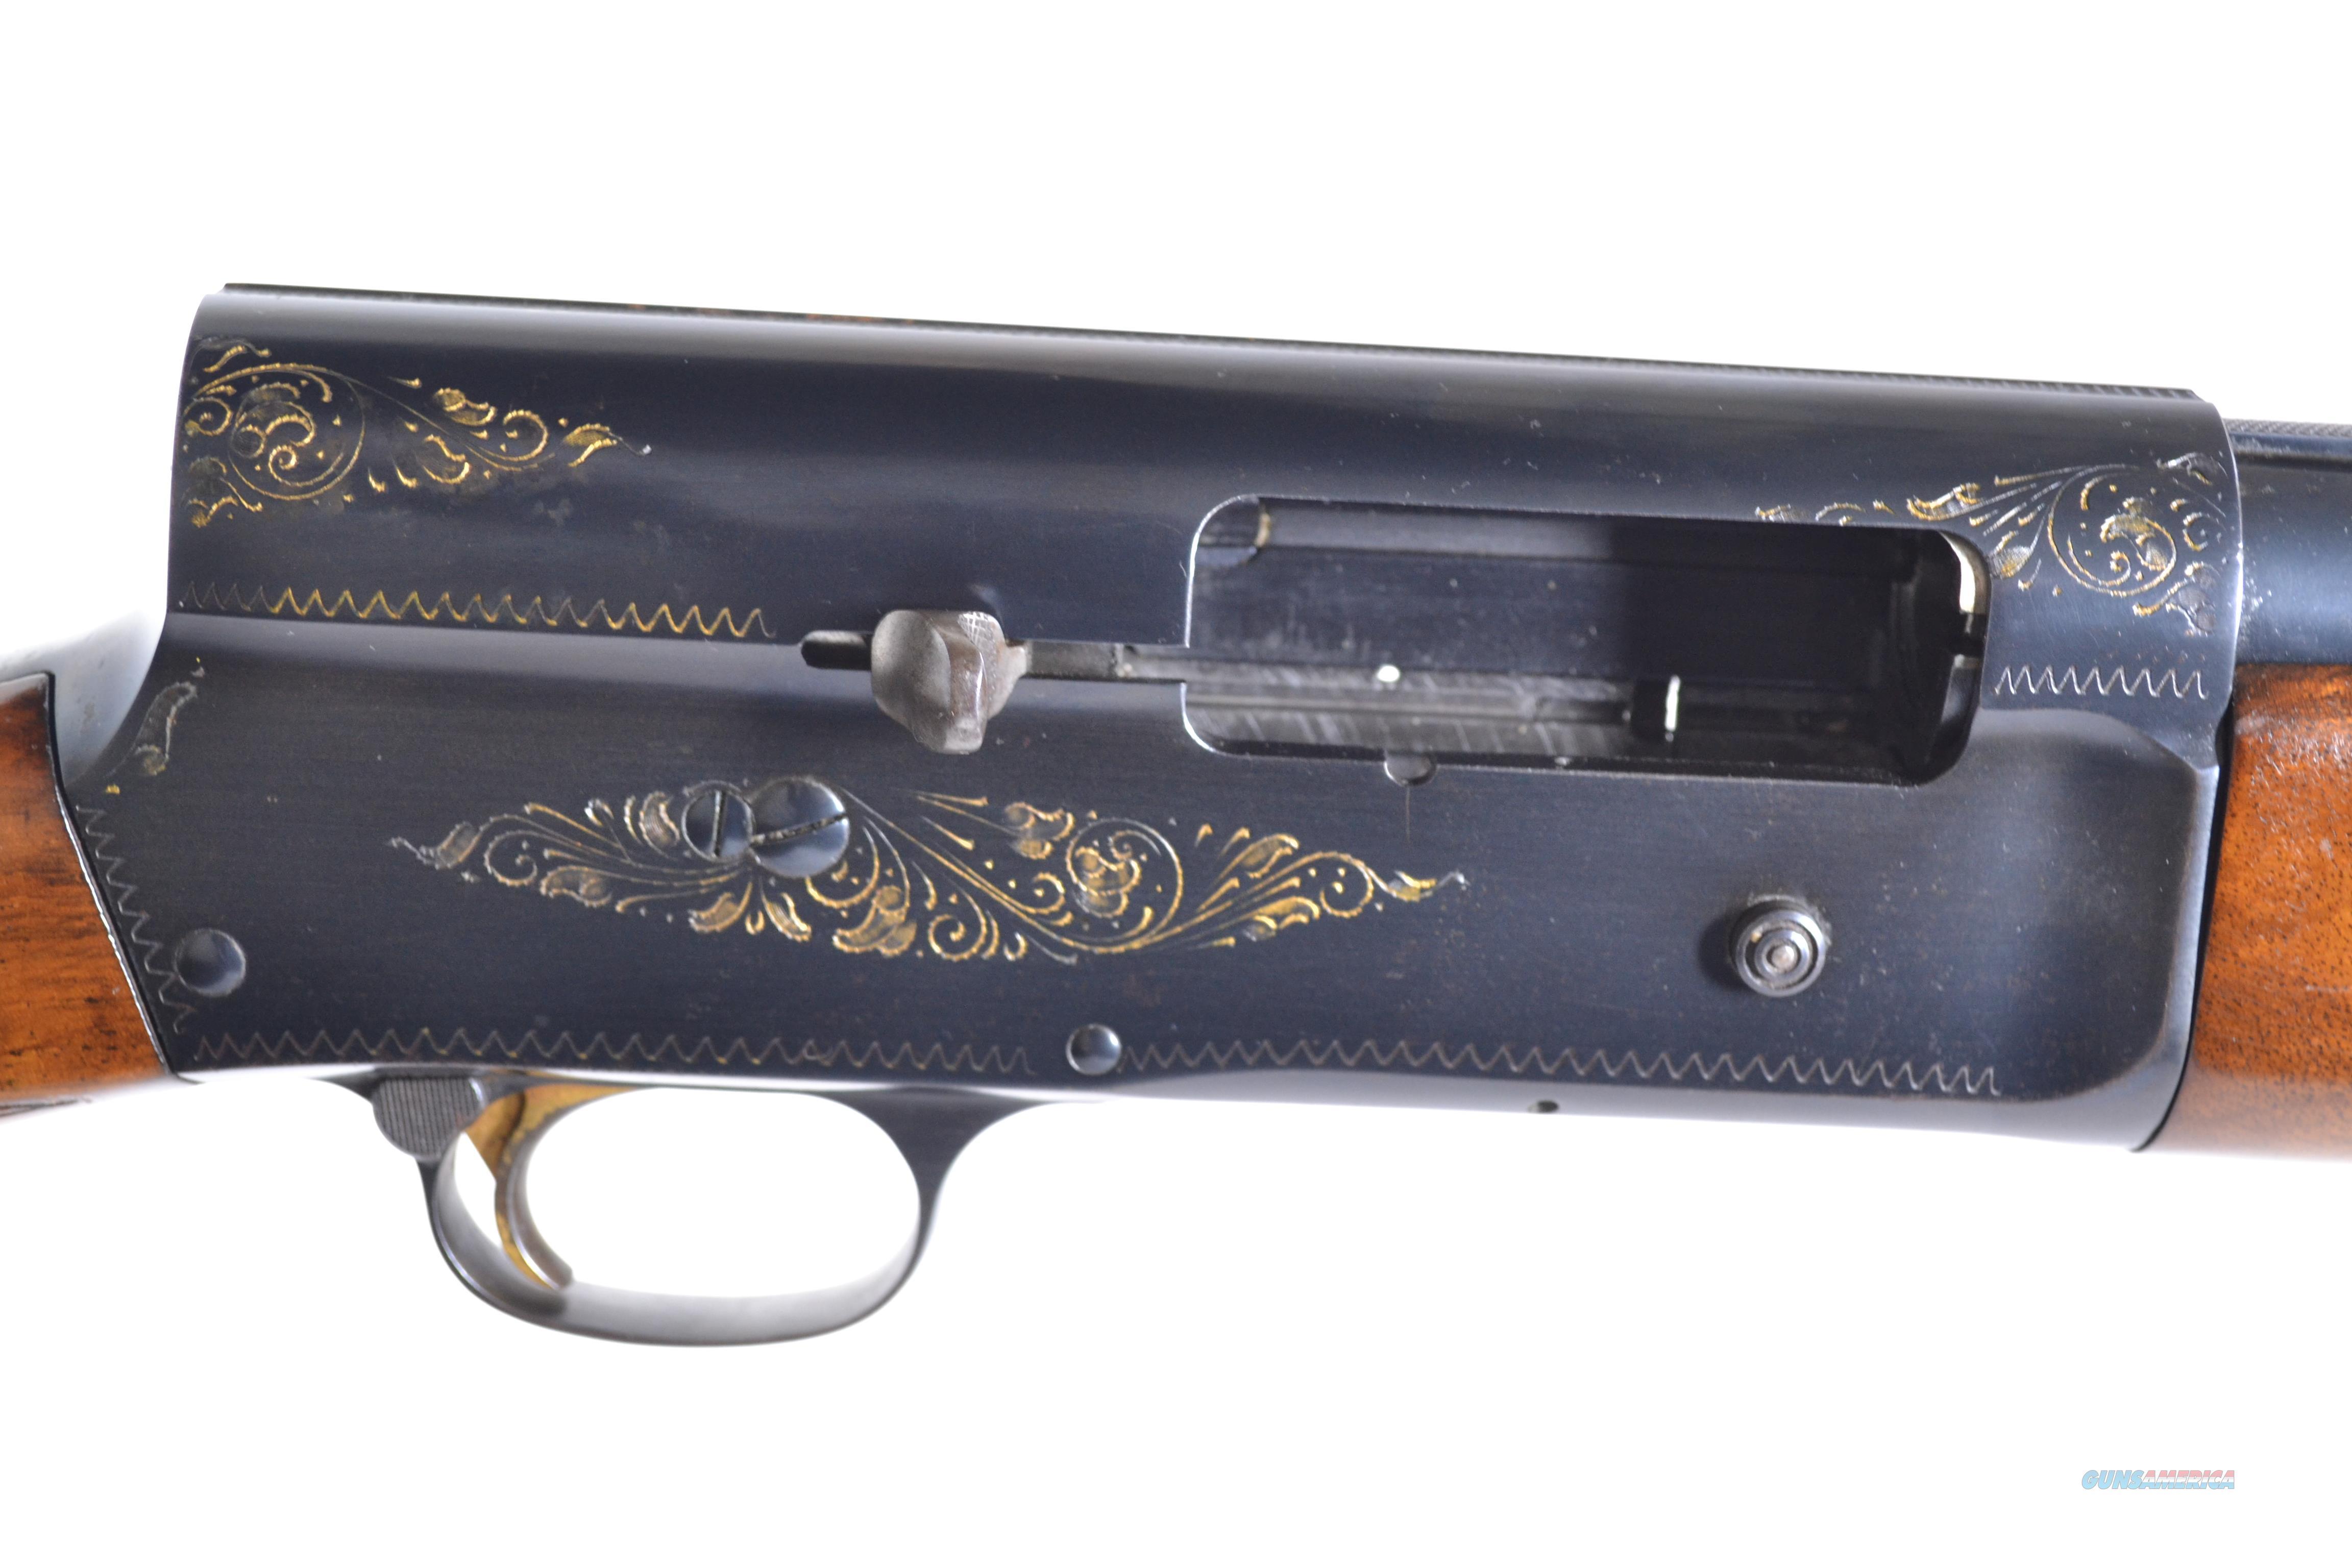 "Browning - A5, Light 12, 12ga. 29 ½"" vent rib barrel choked full  Guns > Shotguns > Browning Shotguns > Single Barrel"